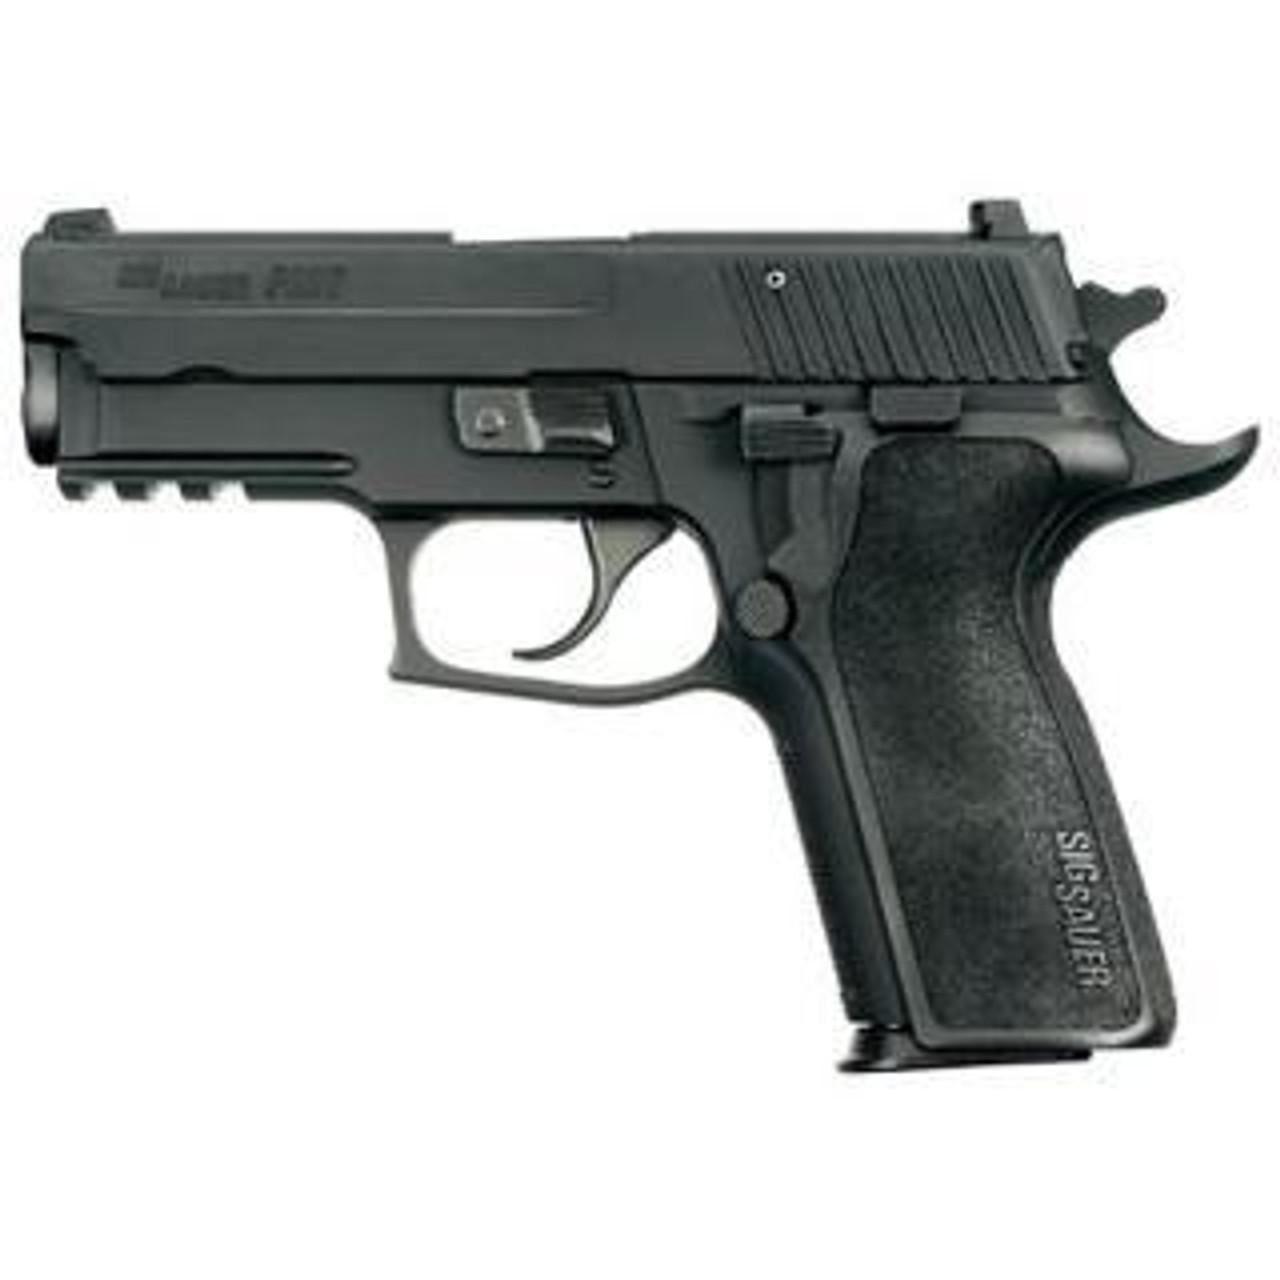 Sig Sauer P229 Enhanced Elite CALIFORNIA LEGAL - .40S&W